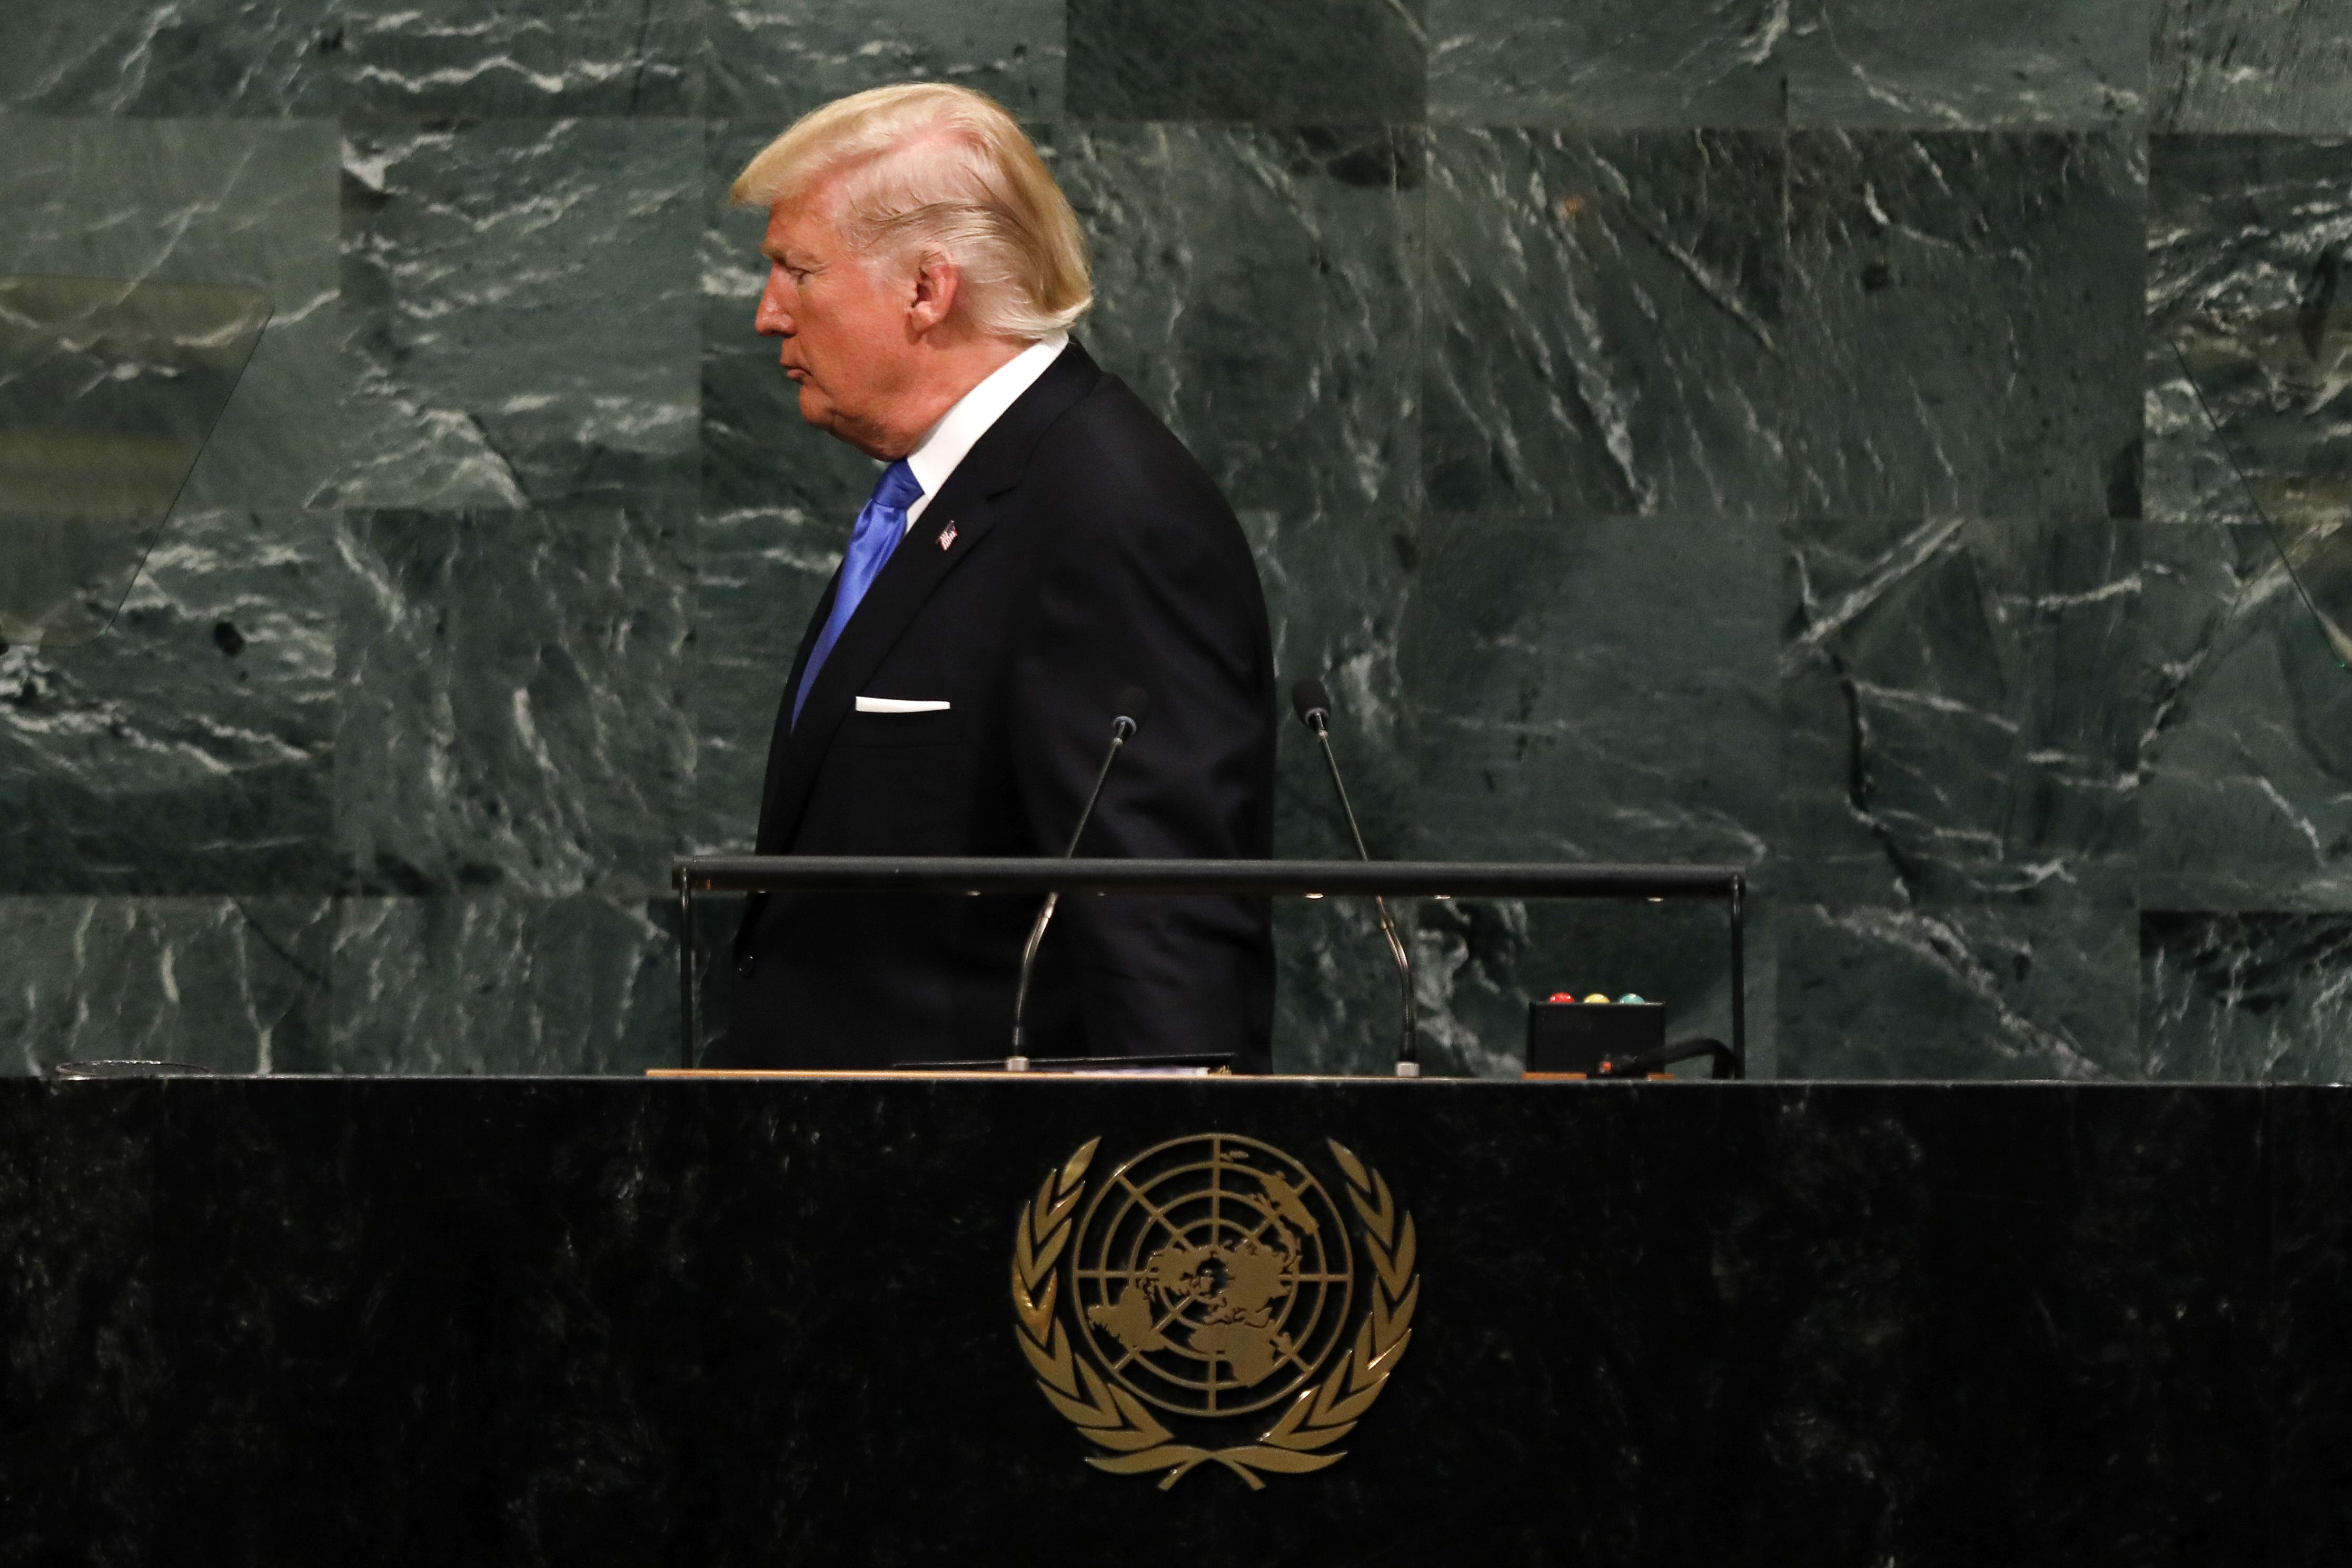 US President Donald Trump. Credit: PA